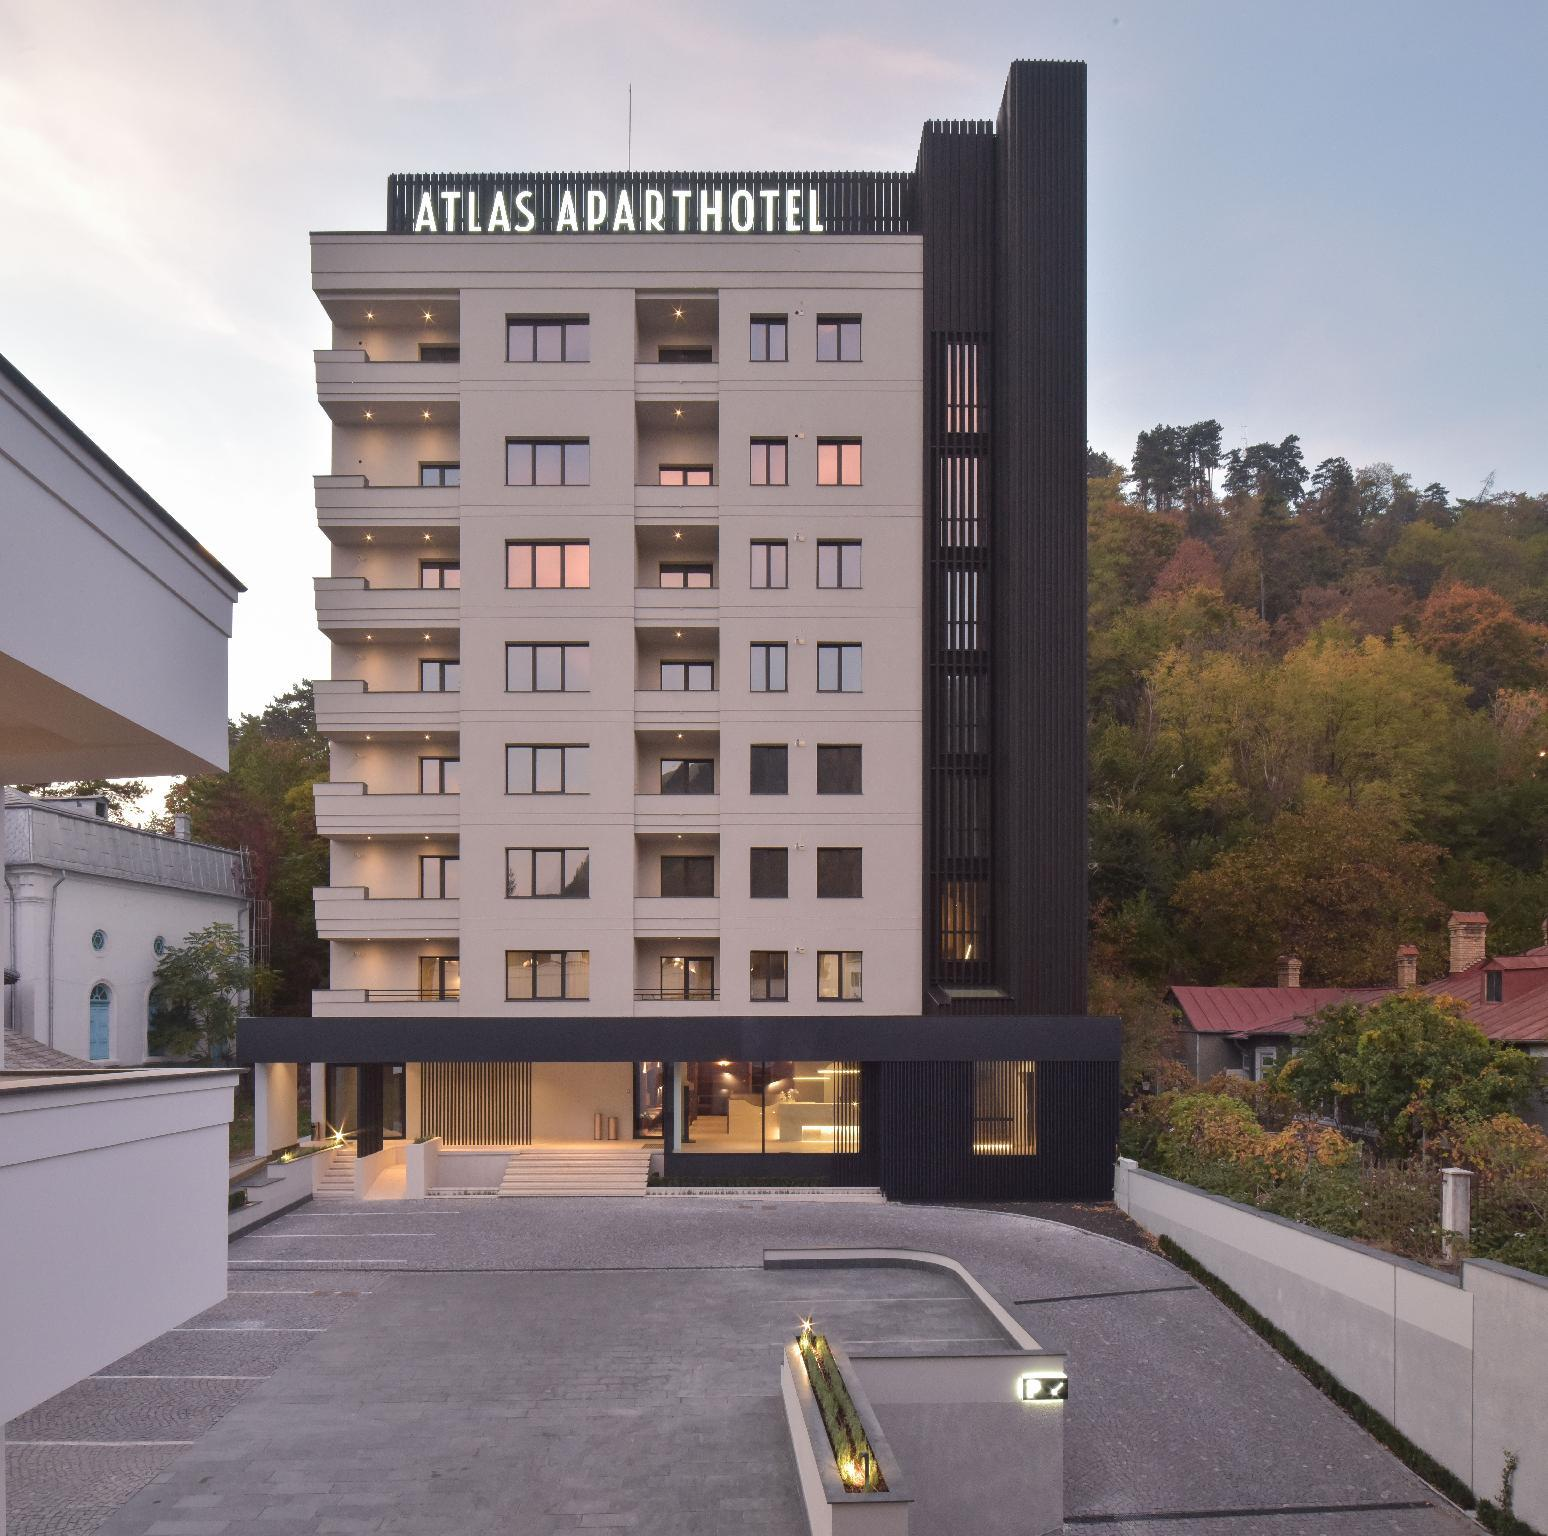 Atlas Aparthotel